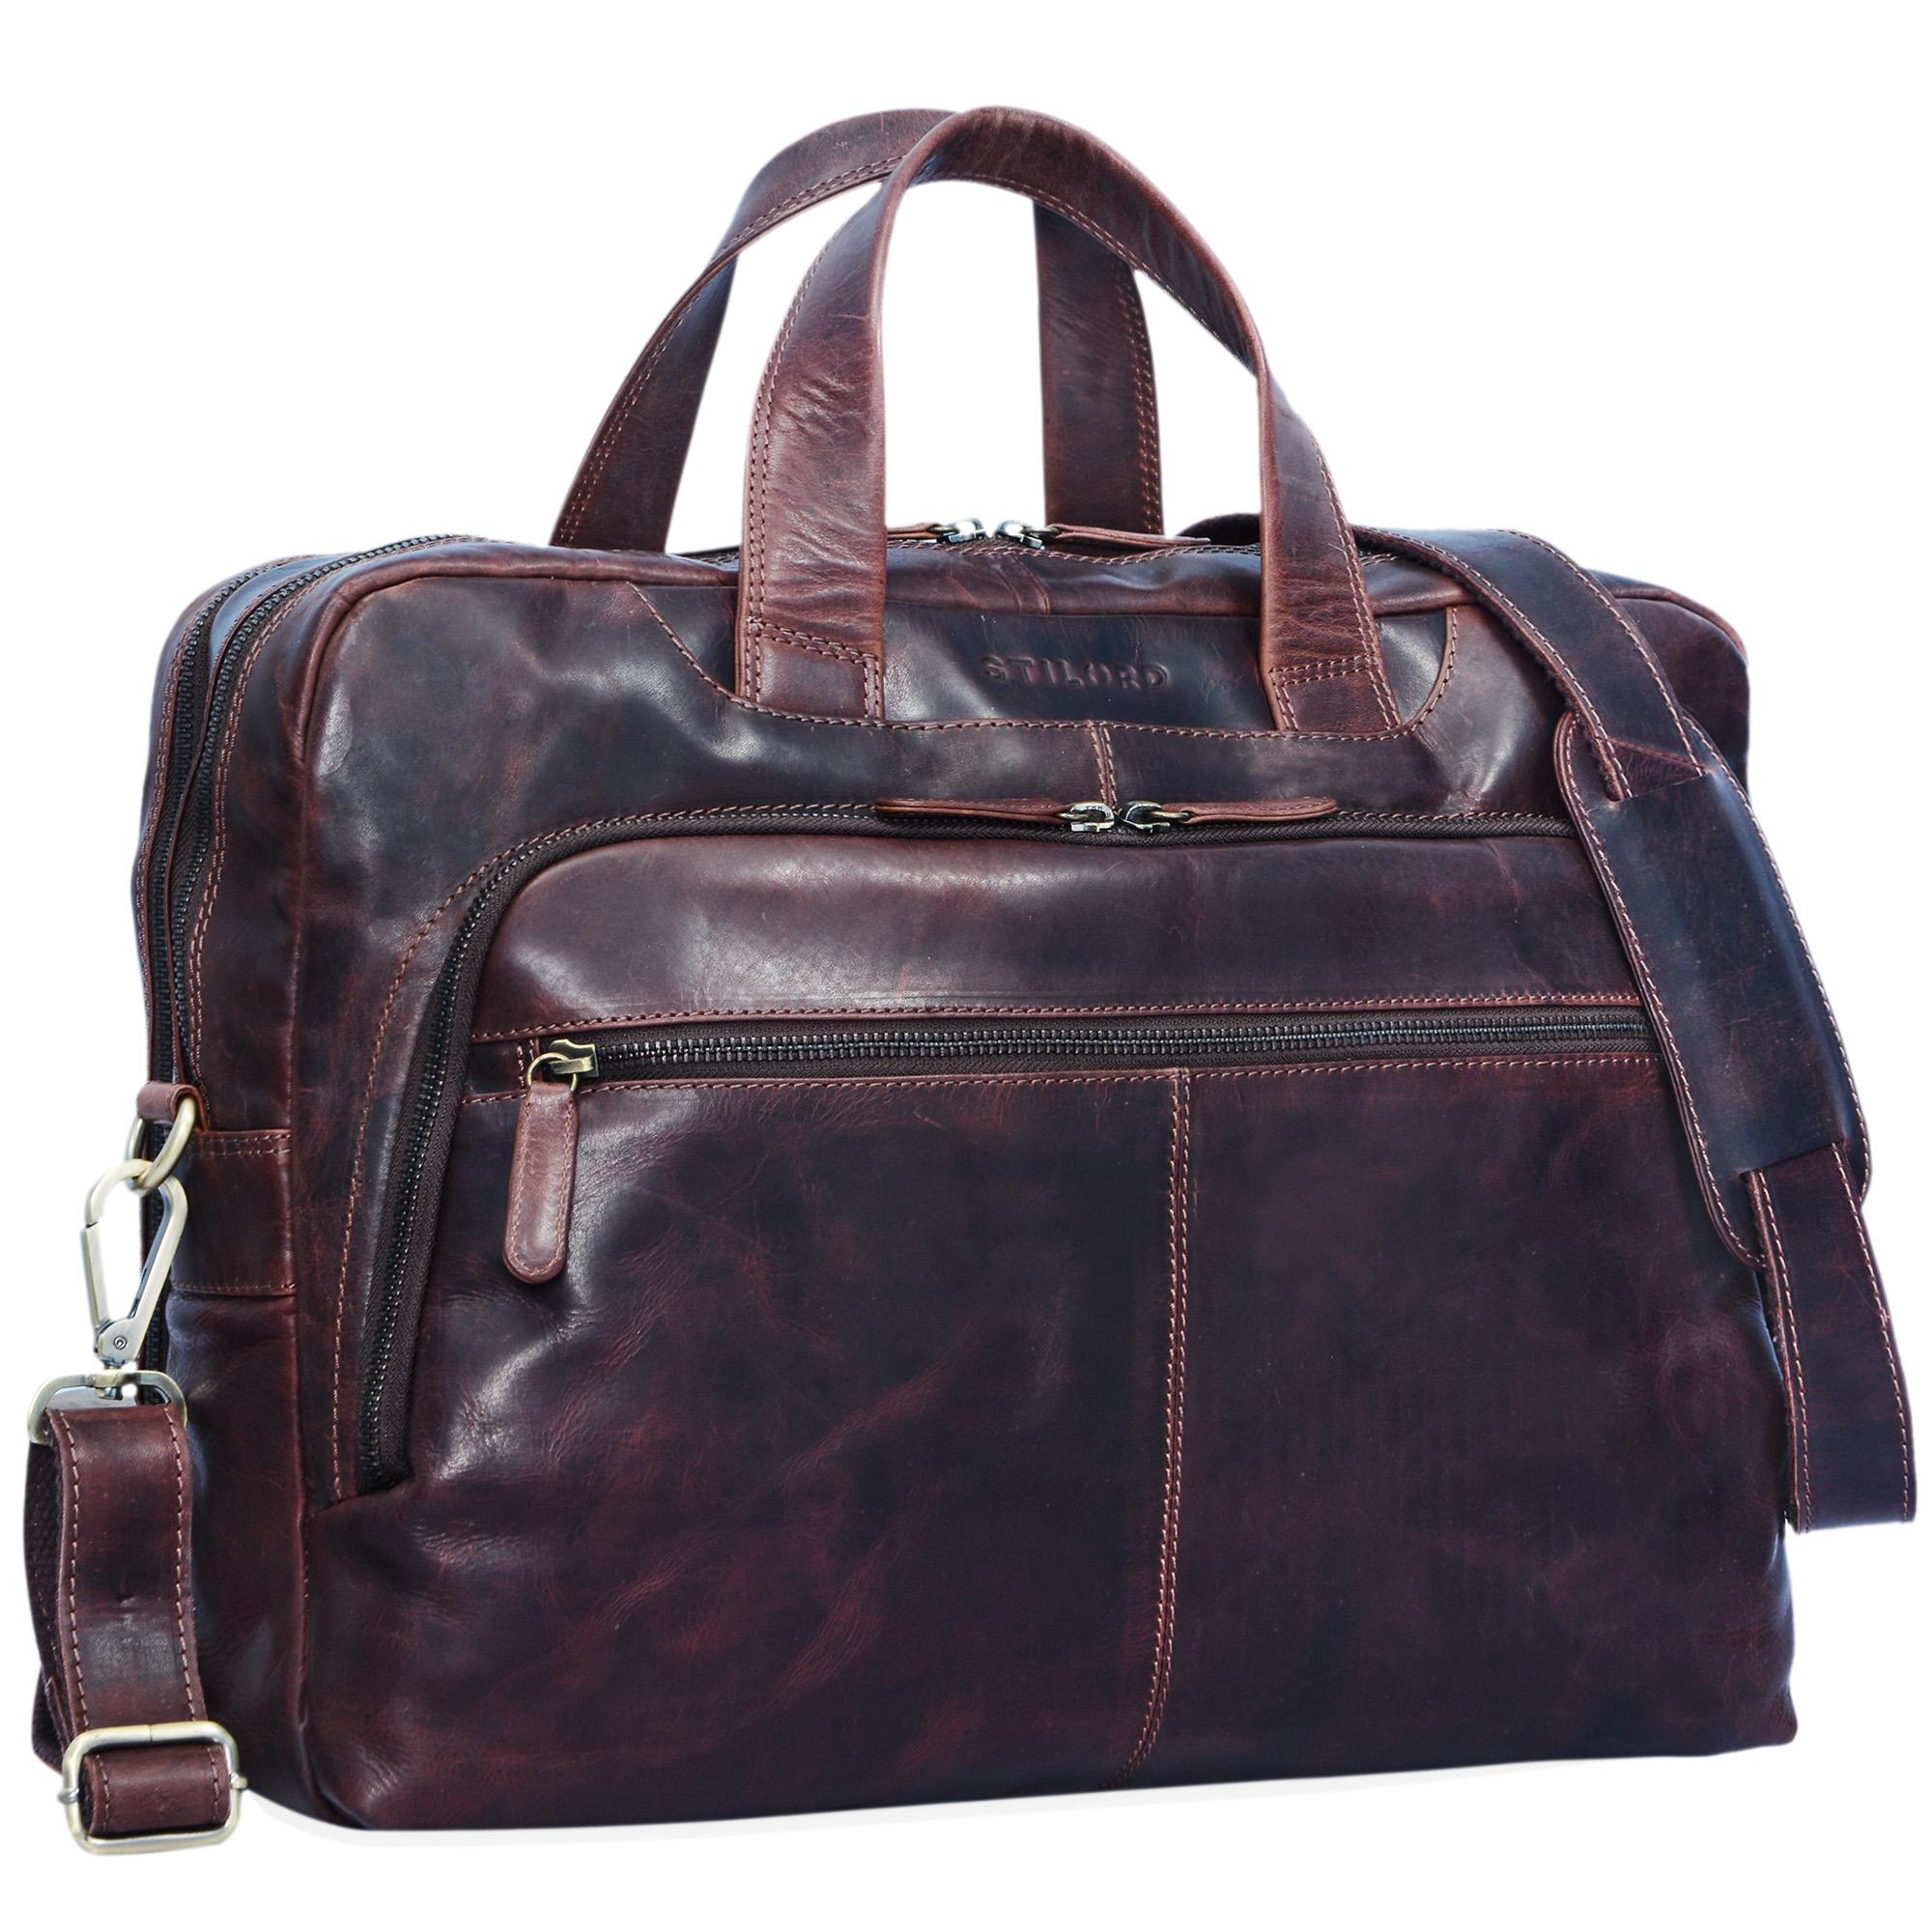 "STILORD ""Lias"" Umhängetasche Leder Herren Vintage 15,6 Zoll Laptoptasche groß Arbeit Büro Uni Antik Leder  - Bild 9"